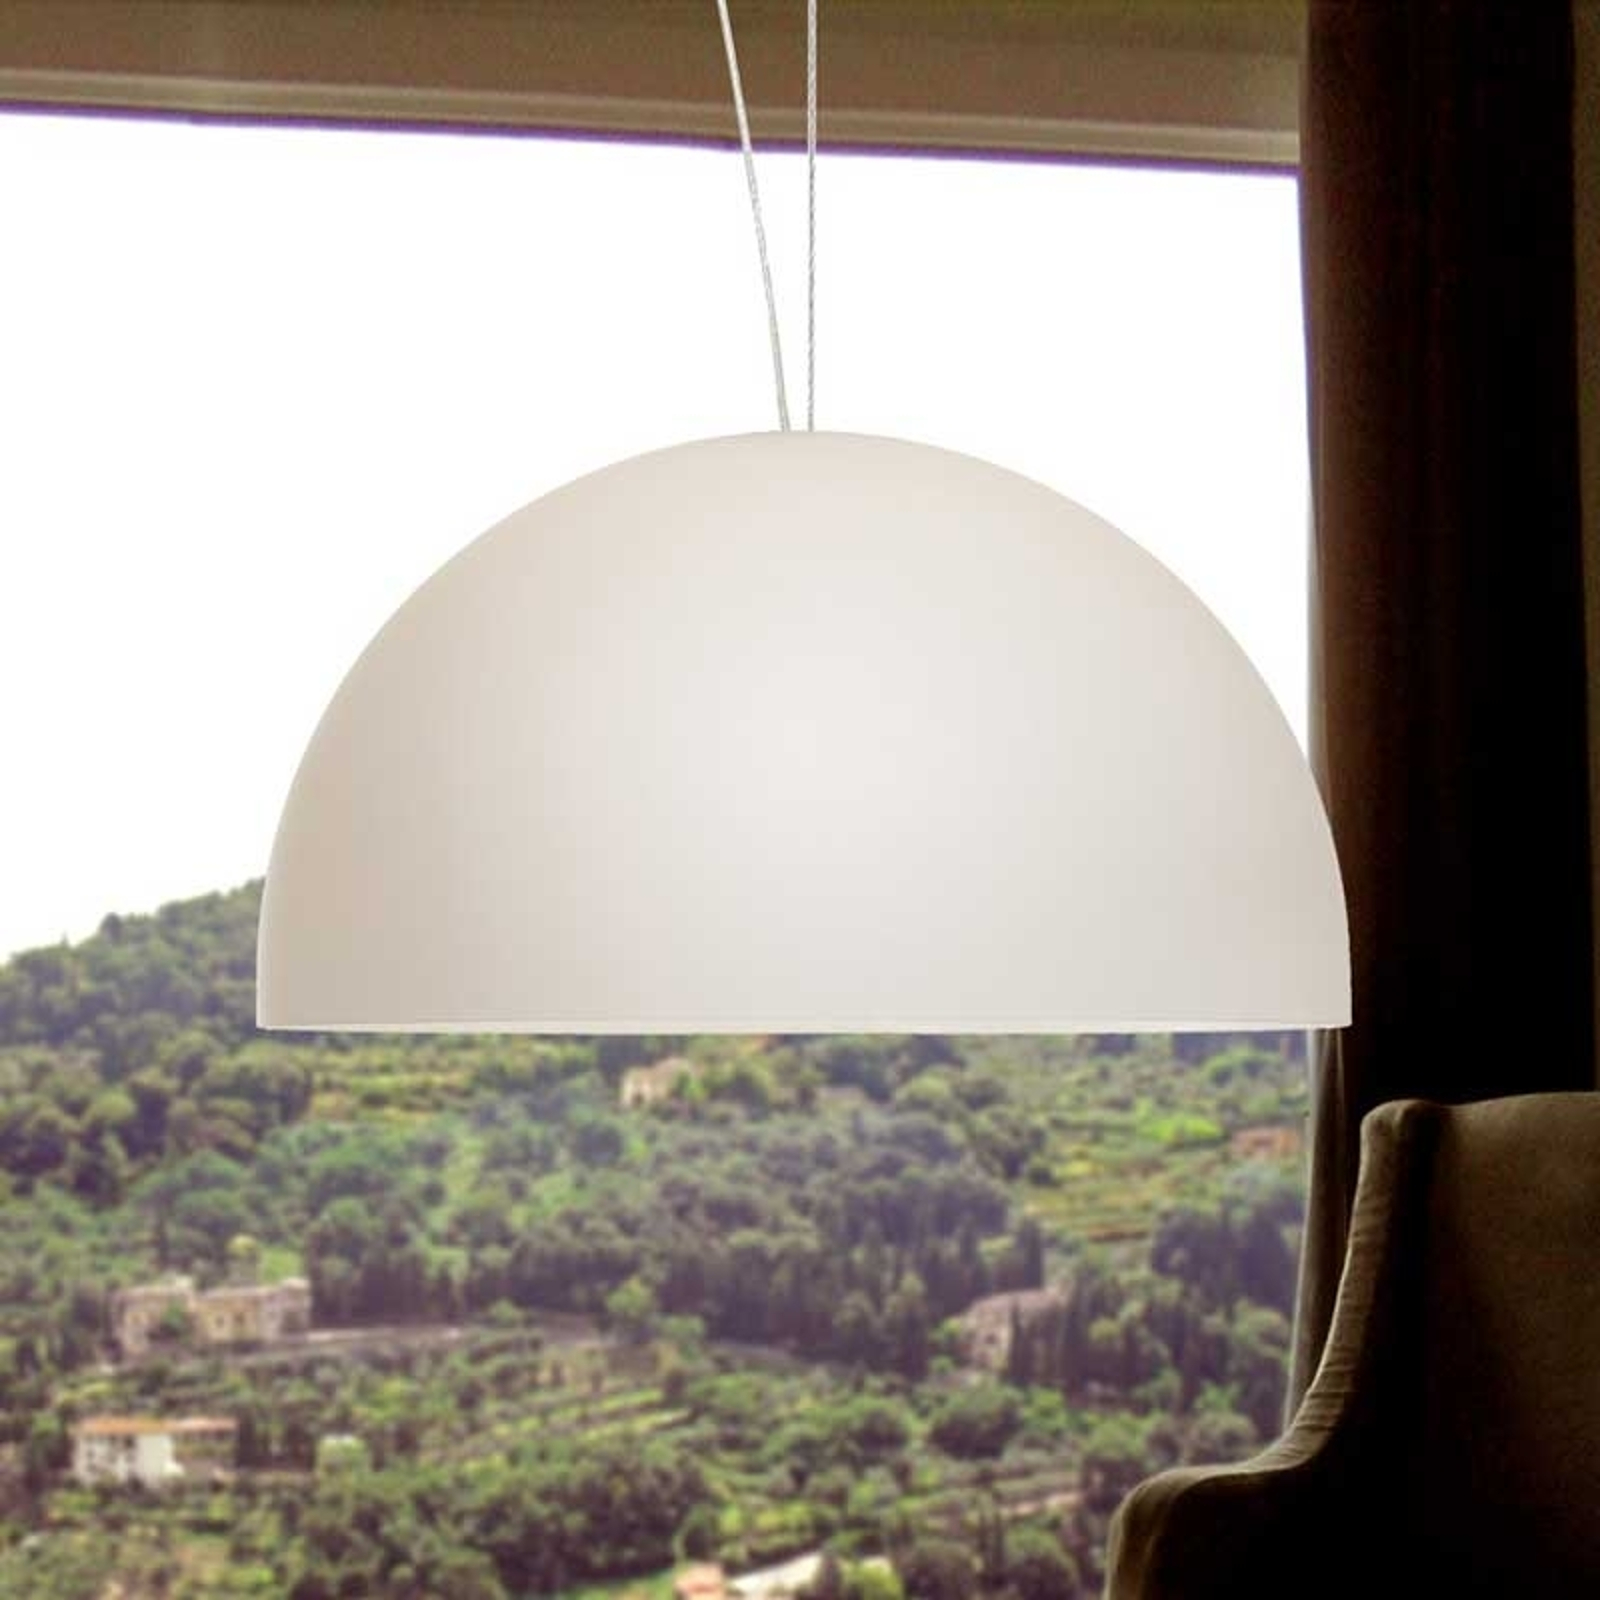 BOWL hengelampe 26 cm et lys